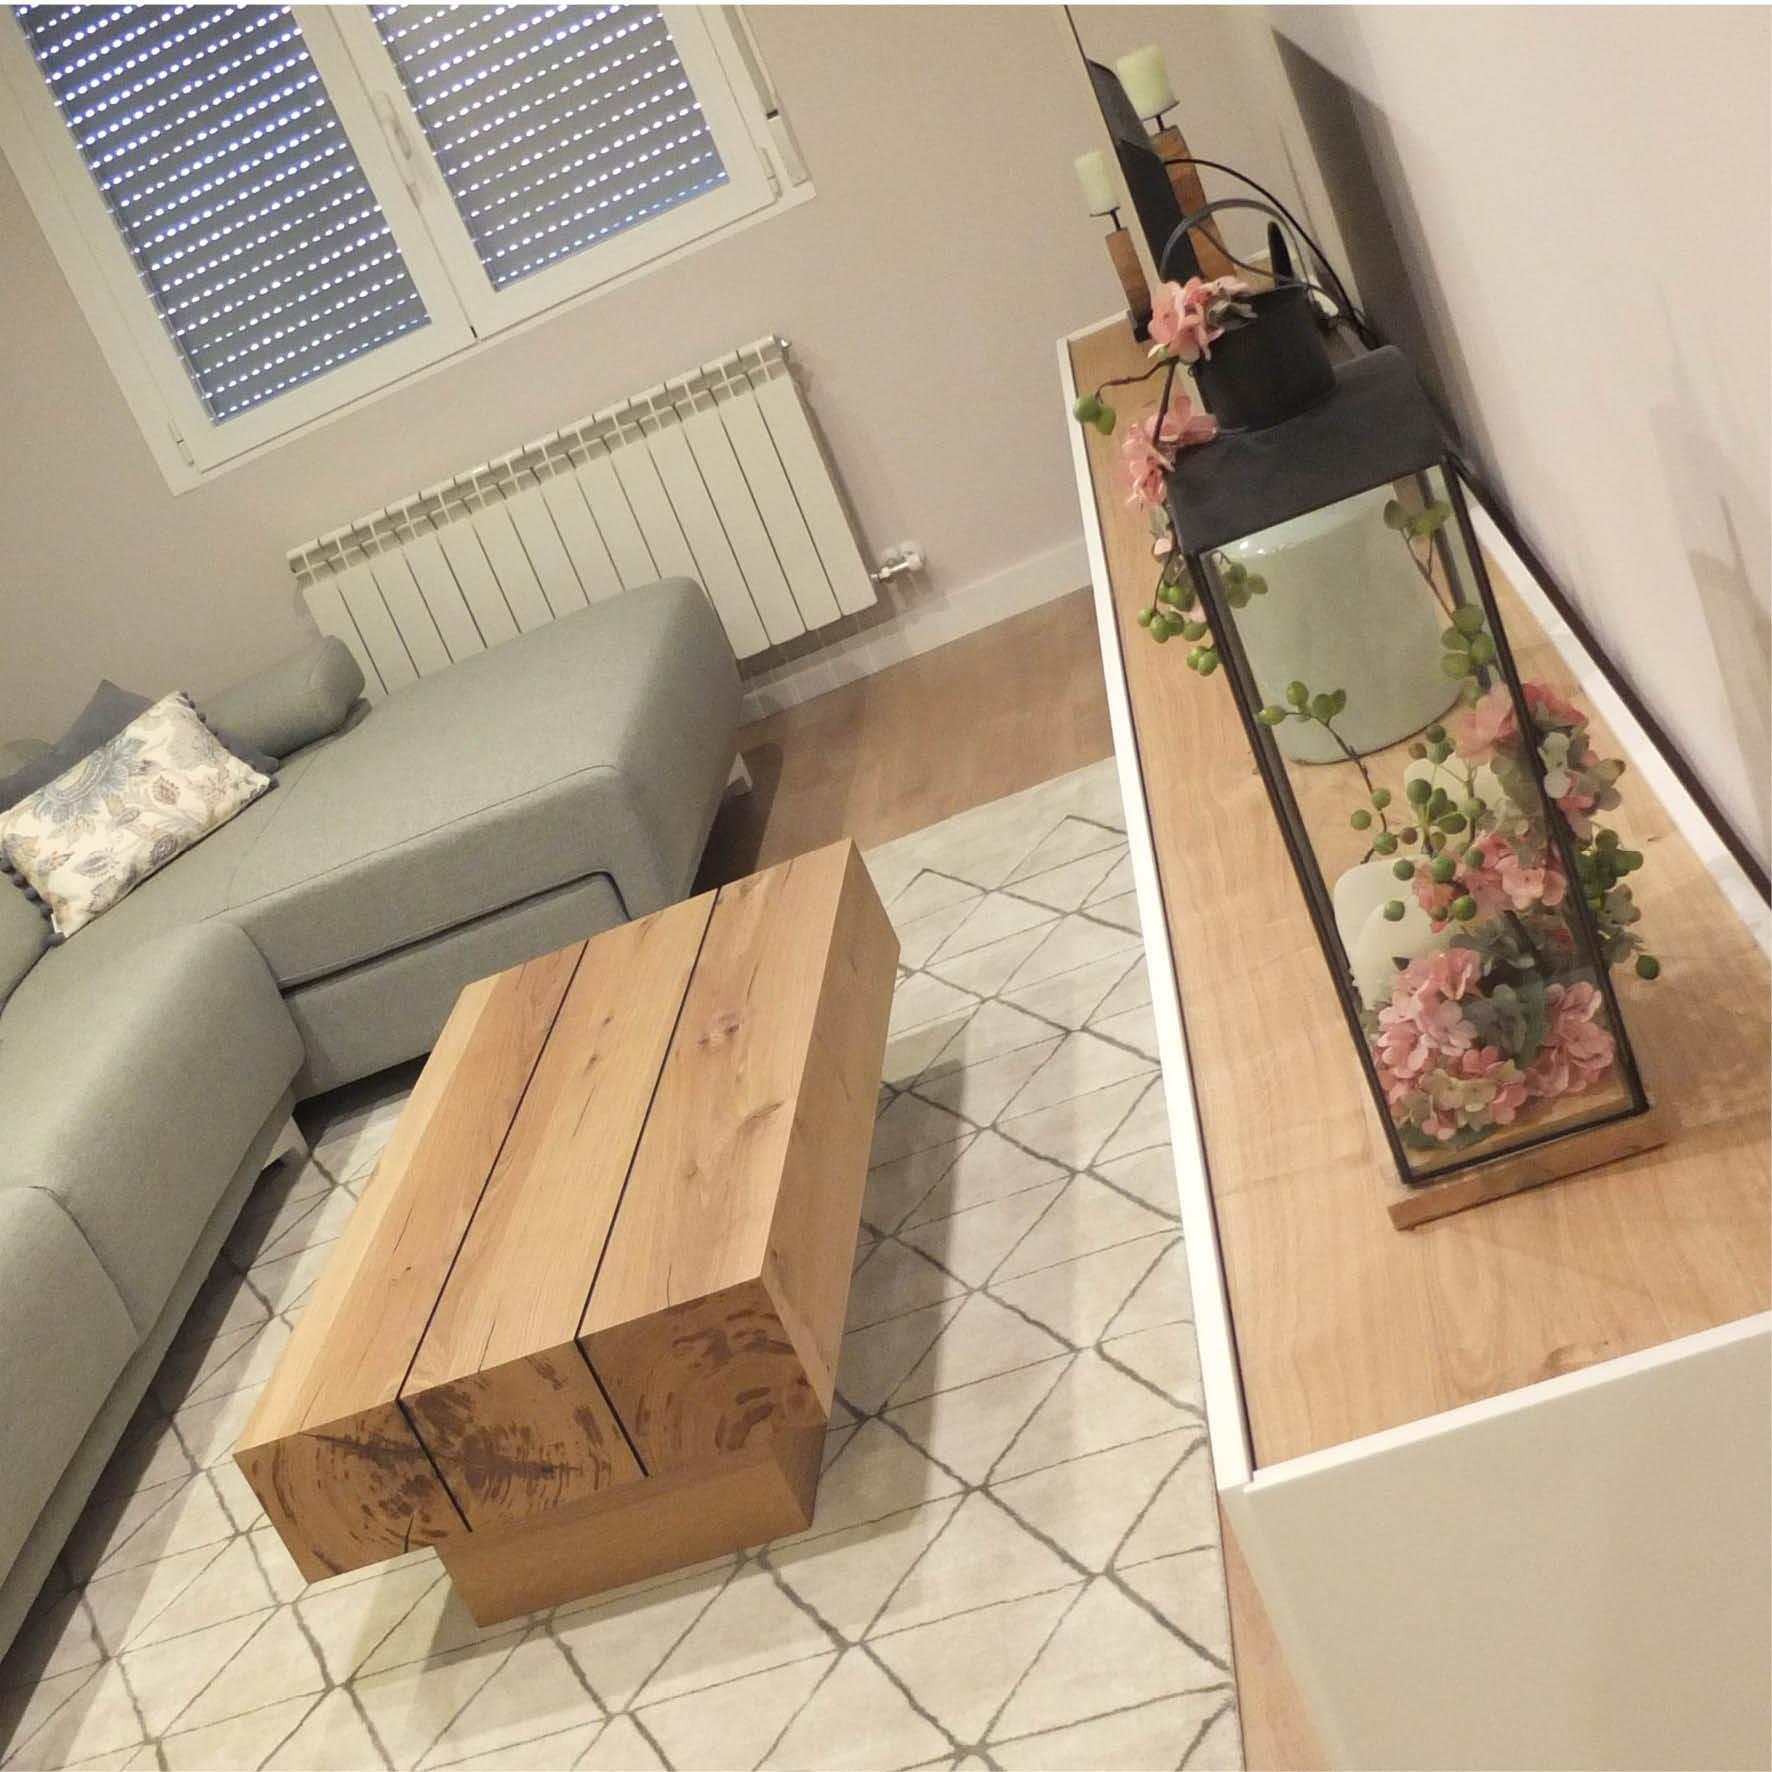 salon-carinena-sisam-muebles-amaya-03